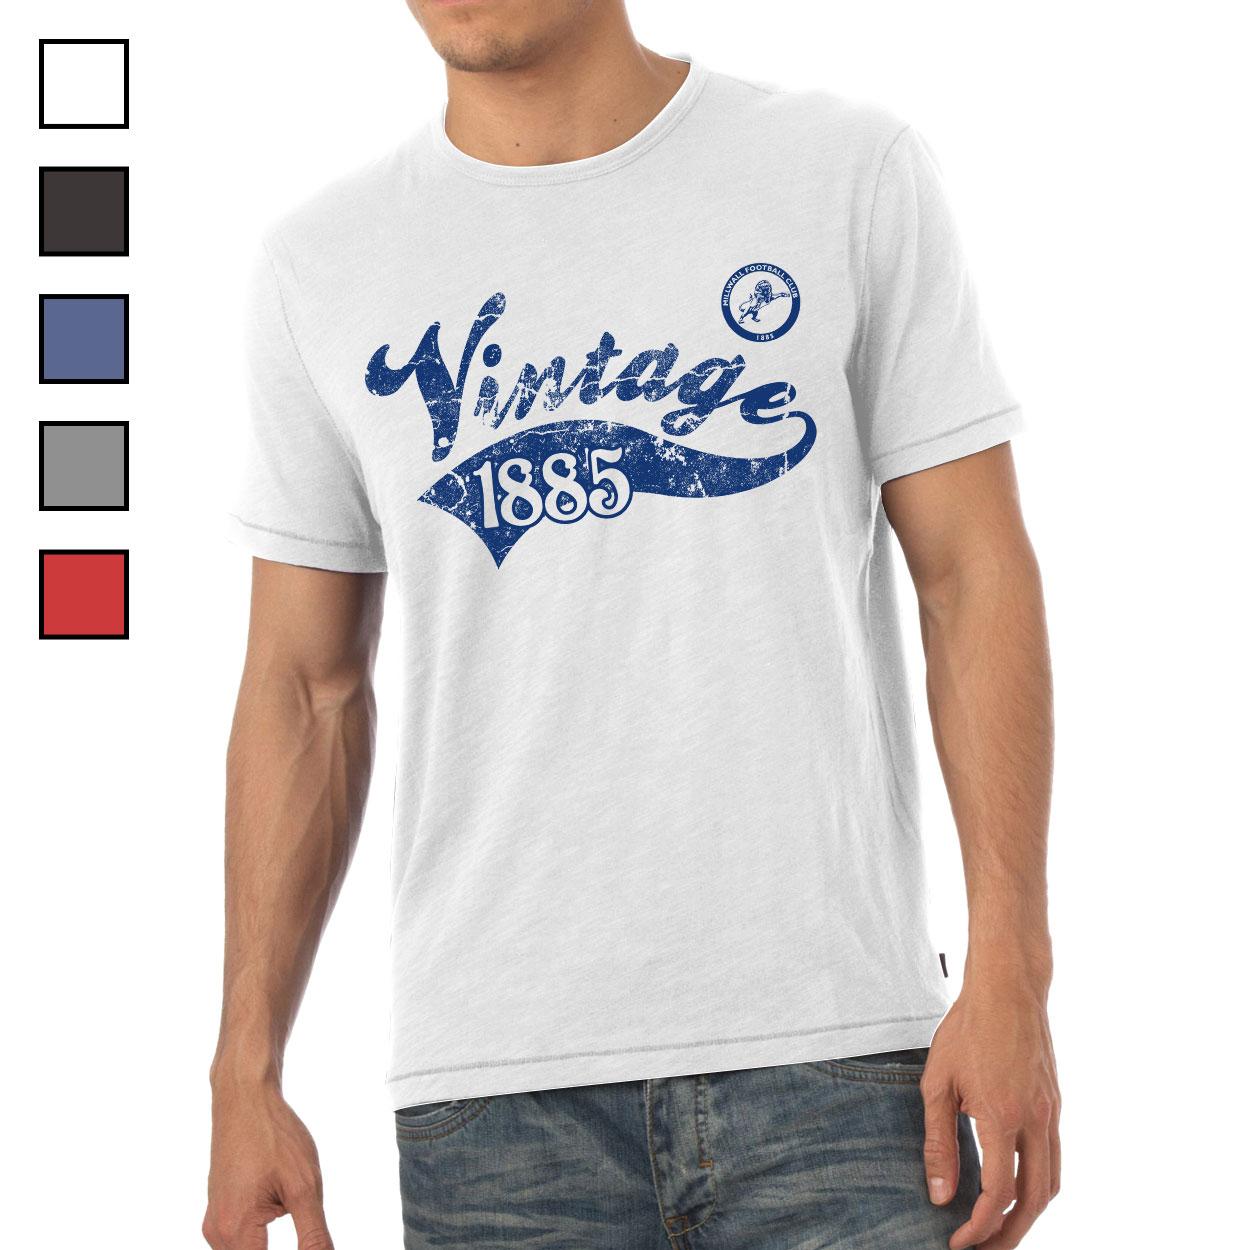 Millwall FC Mens Vintage T-Shirt